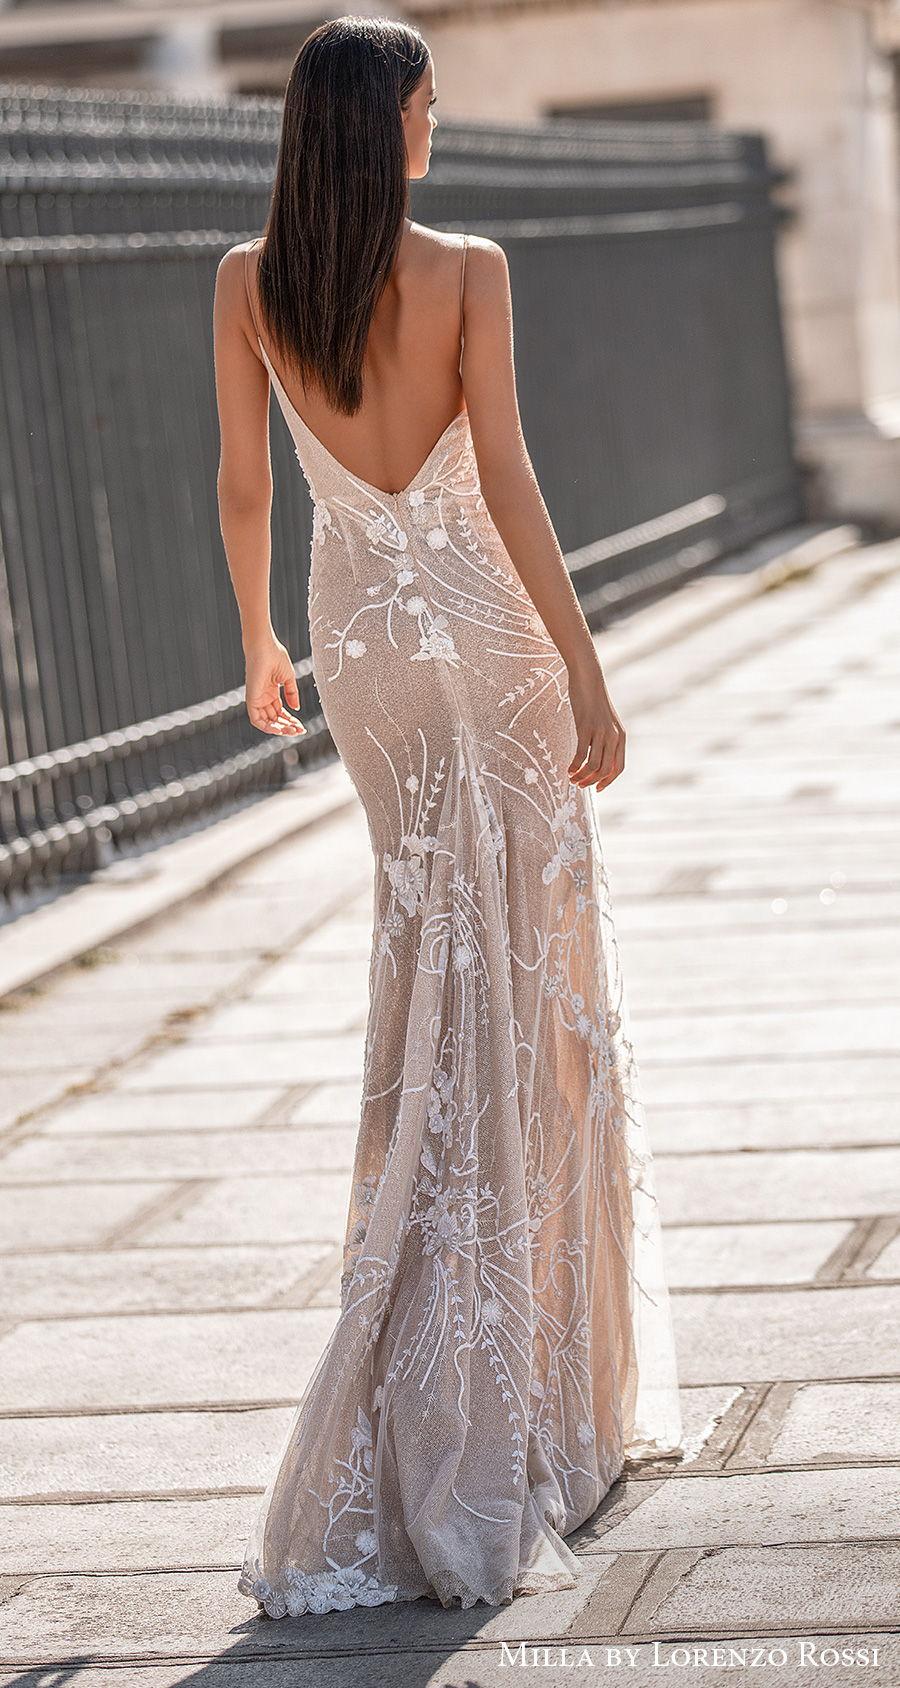 milla lorenzo rossi 2021 bridal sleeveless spaghetti strap deep plunging sweetheart neckline full embellishment sexy elegant sheath wedding dress low back sweep train (daisy) bv